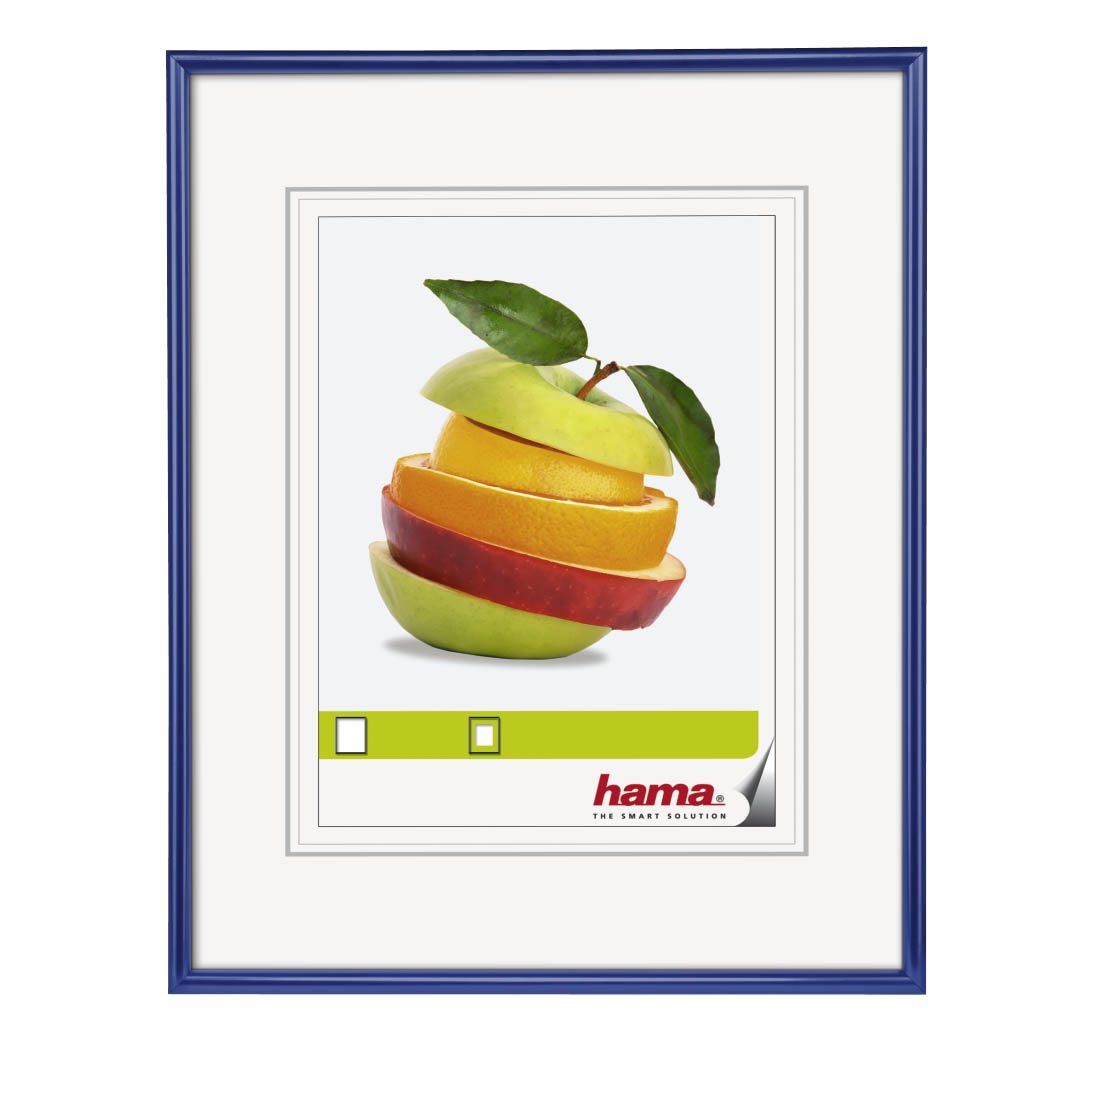 30x40cm Hama Sevilla Plastic Frame Black